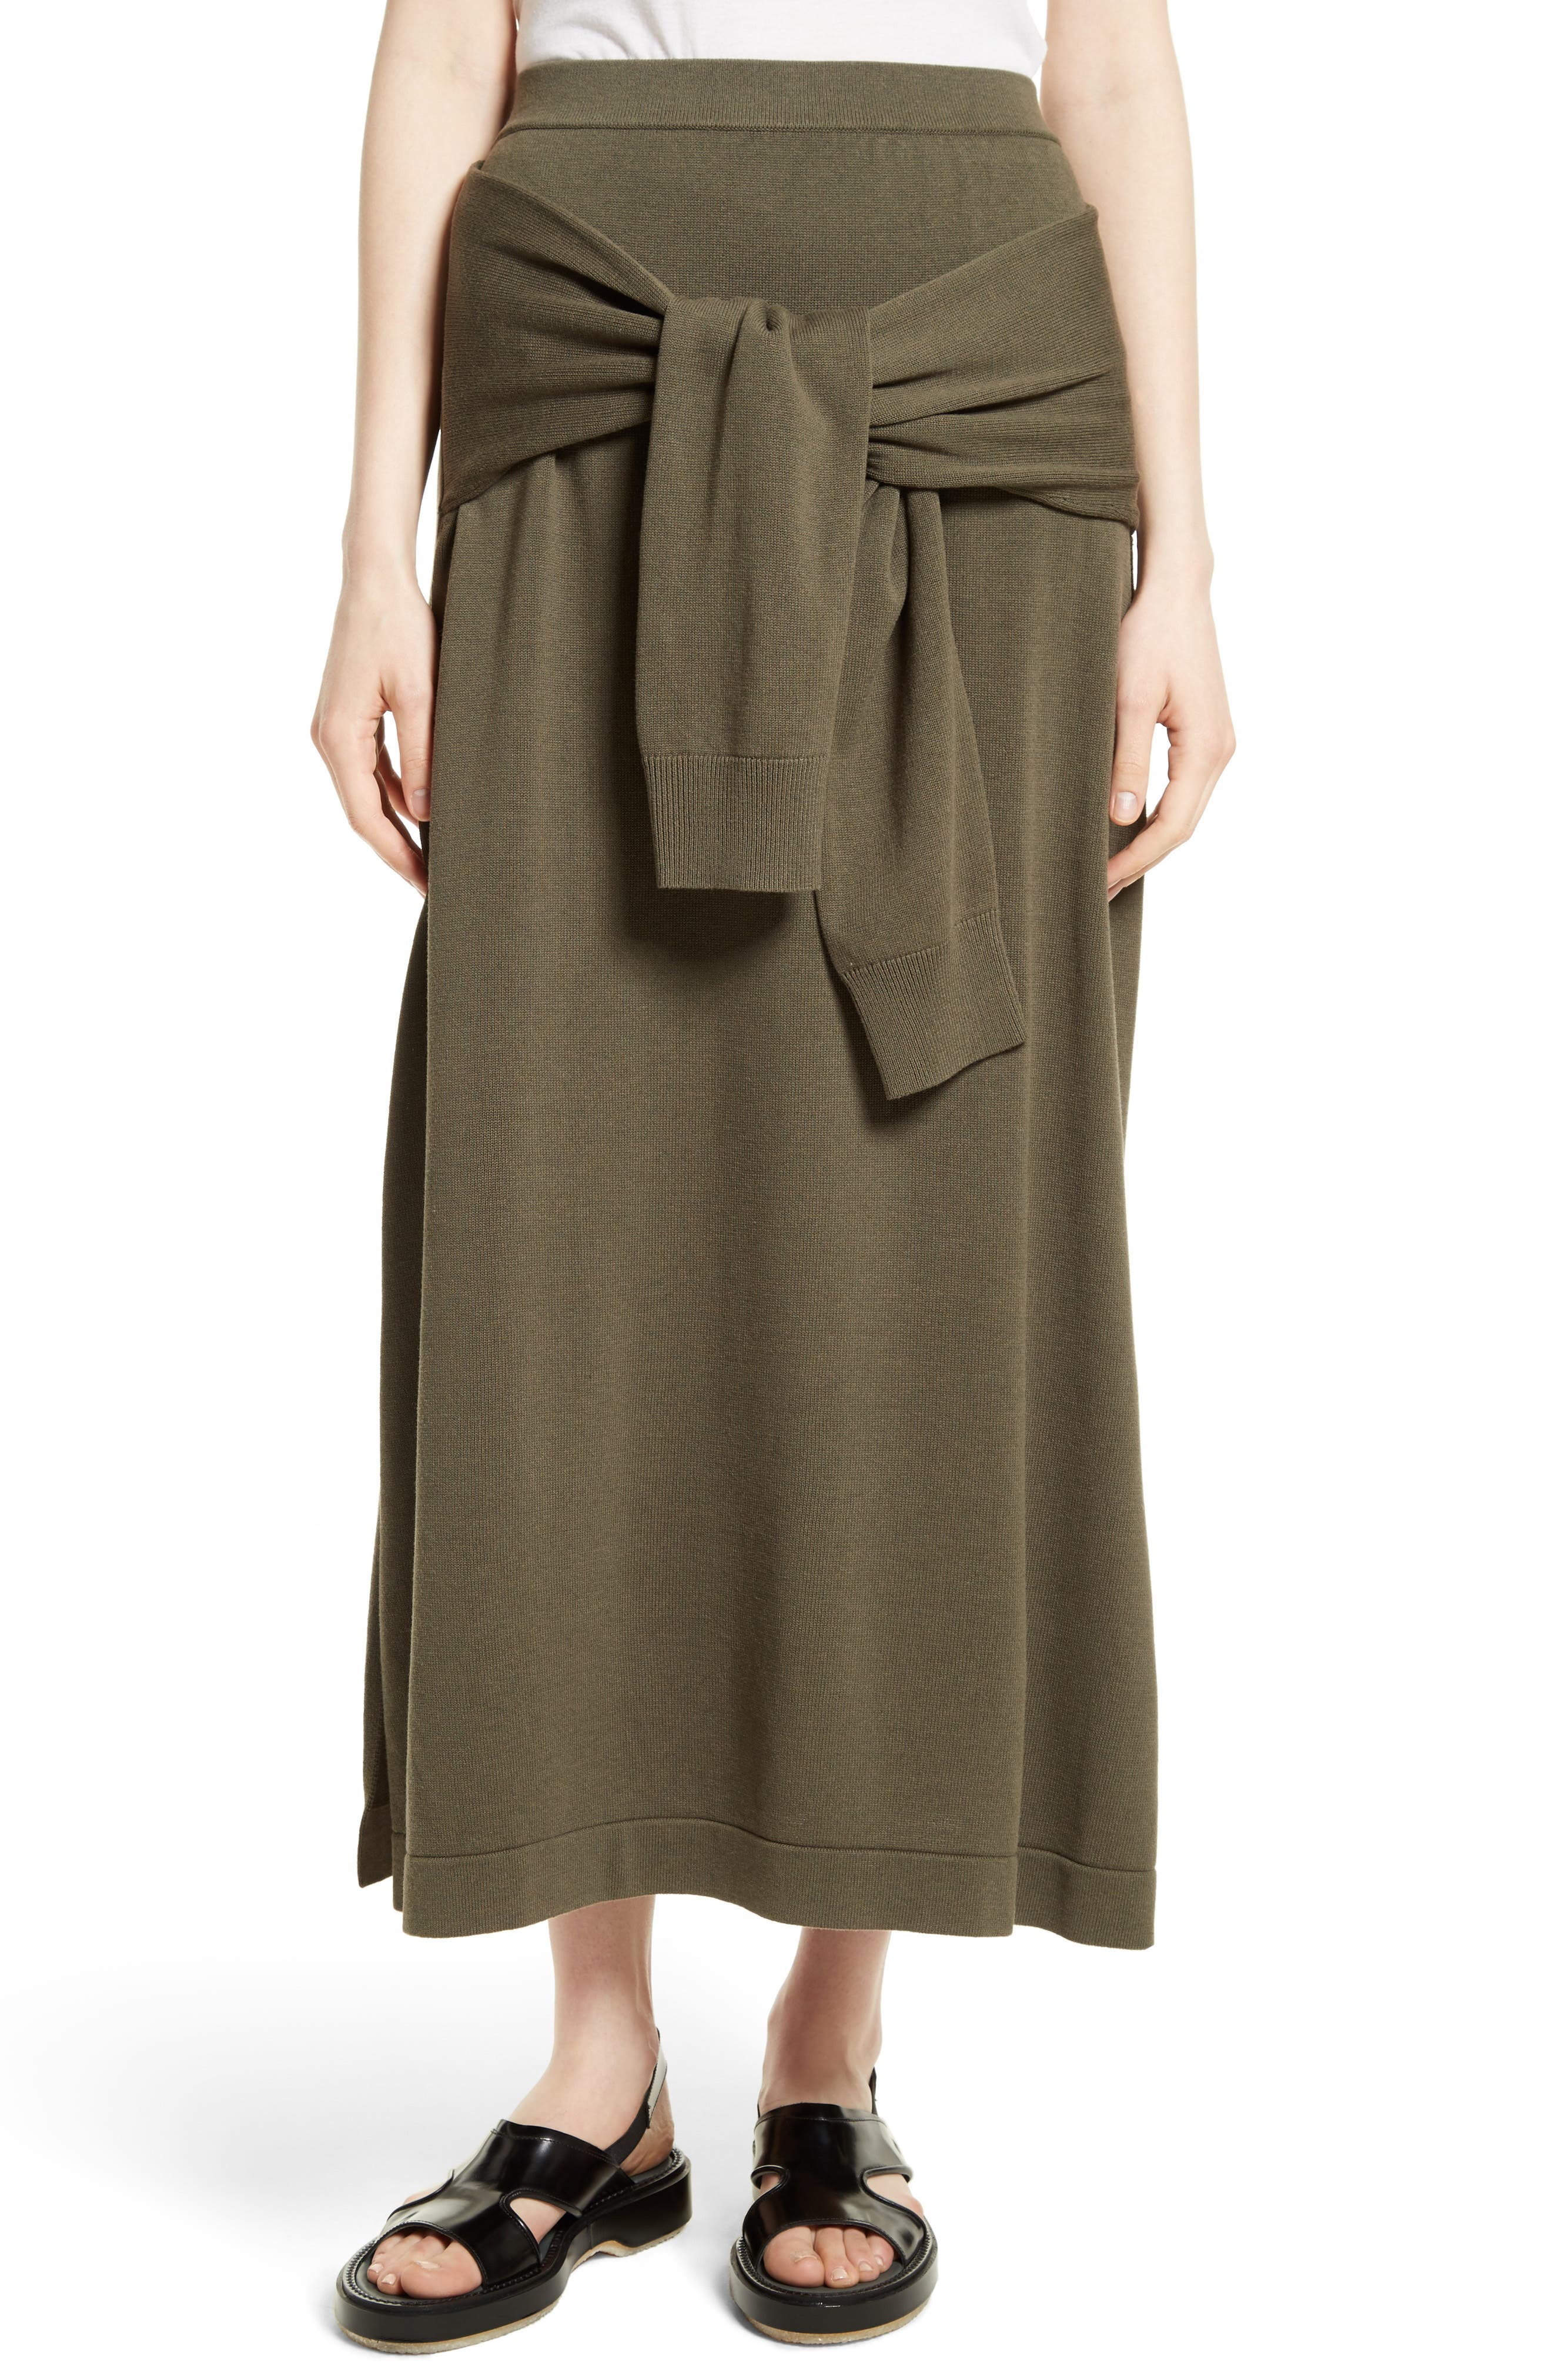 JOSEPH Tie Detail Knit Maxi Skirt